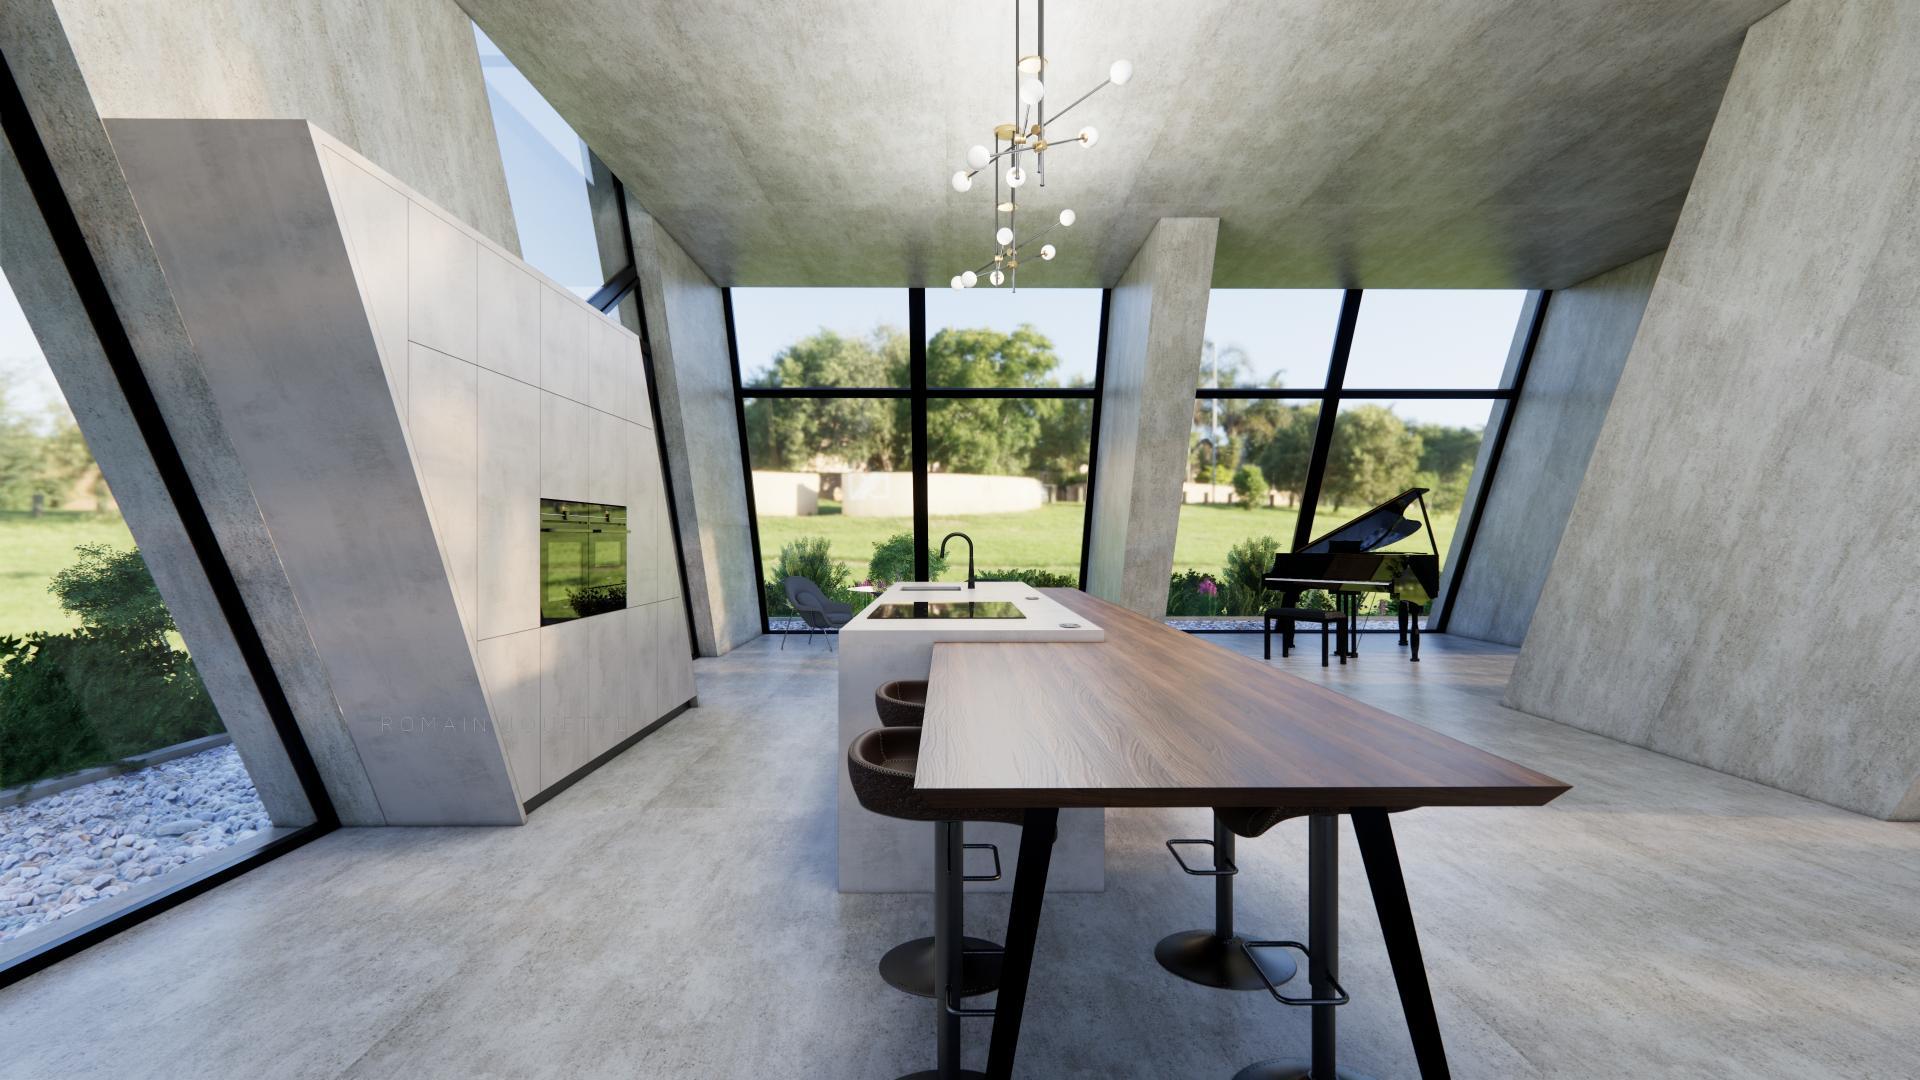 Cuisine loft gris beton et noyer g